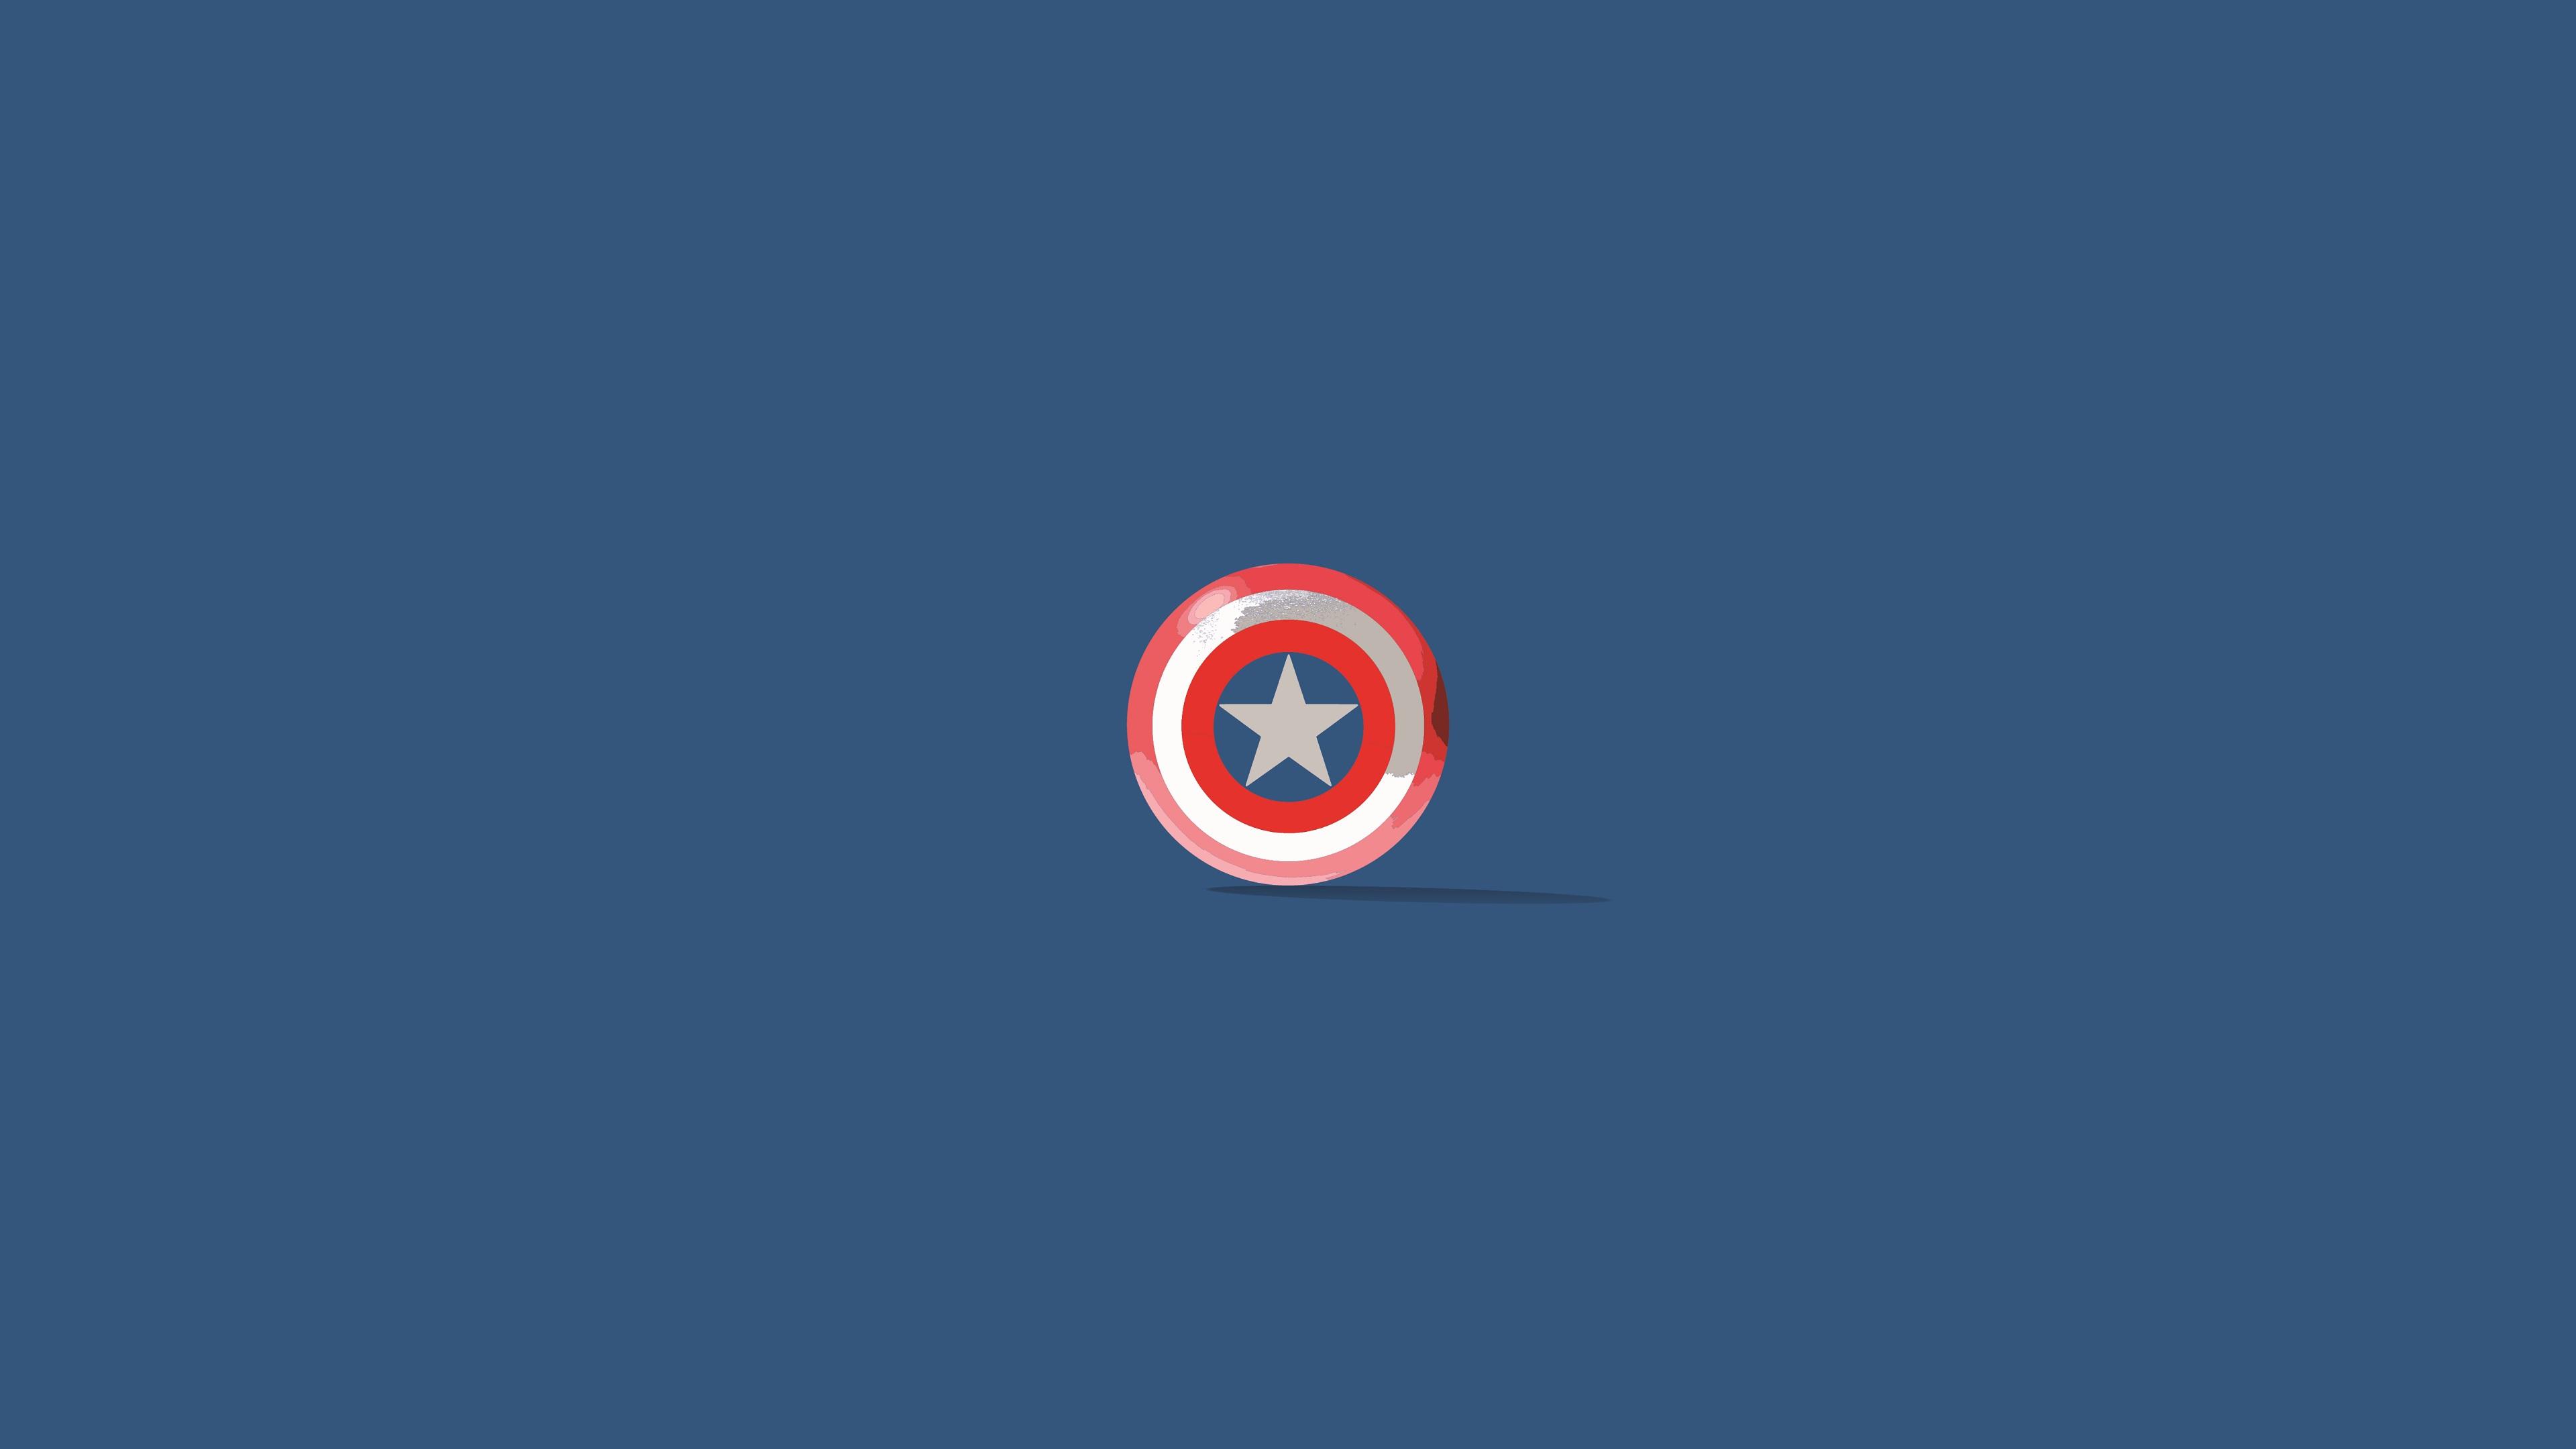 Captain America Shield 20k Ultra HD Wallpaper   Hintergrund   38200x20